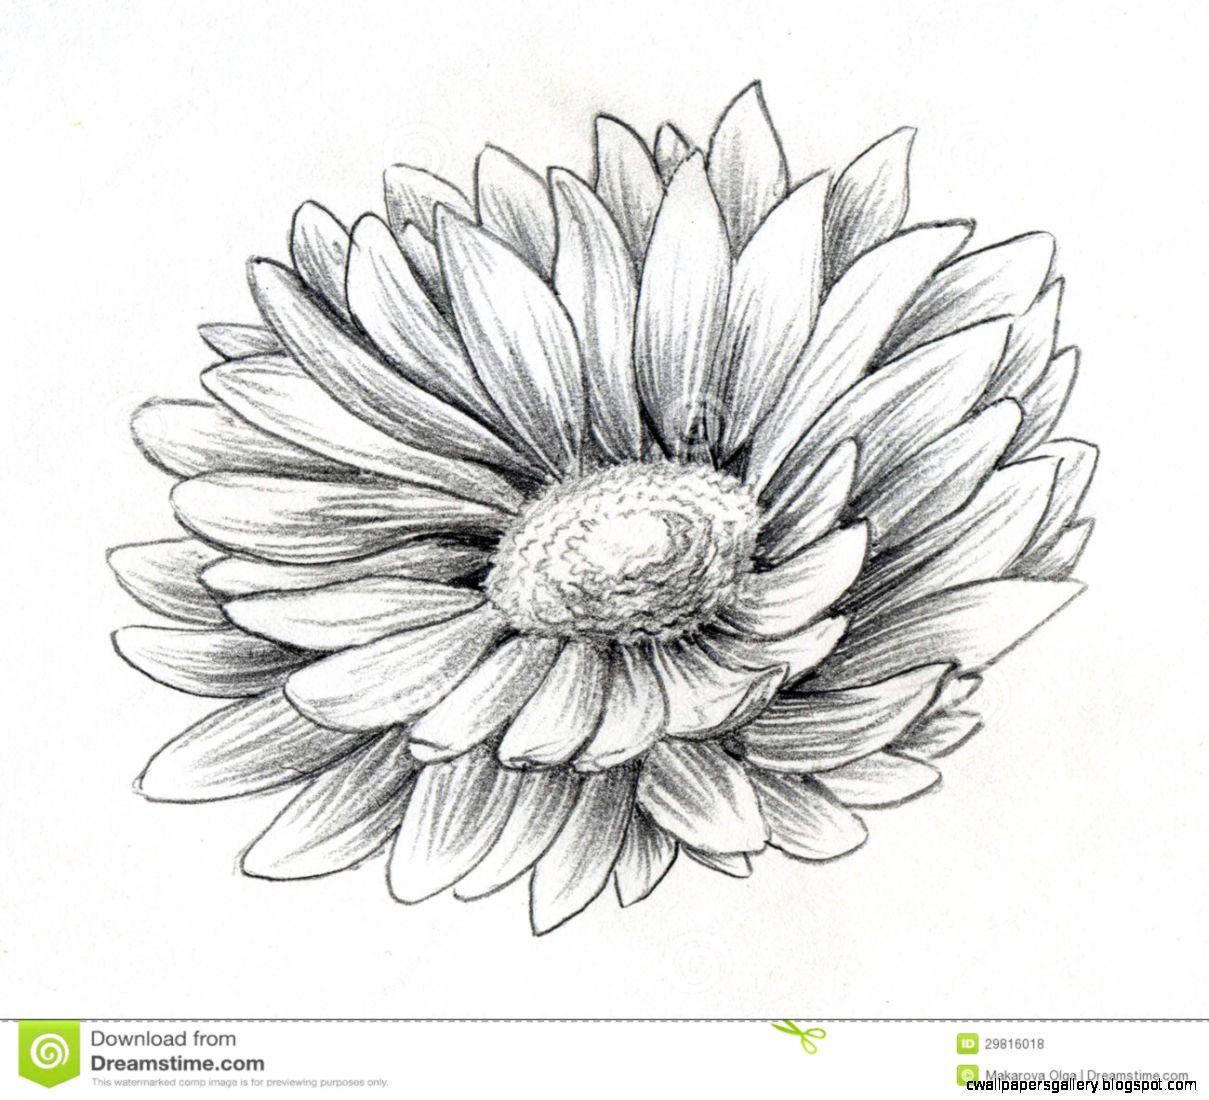 Daisy Flower Pencil Sketch Royalty Free Stock Photos   Image 29816018